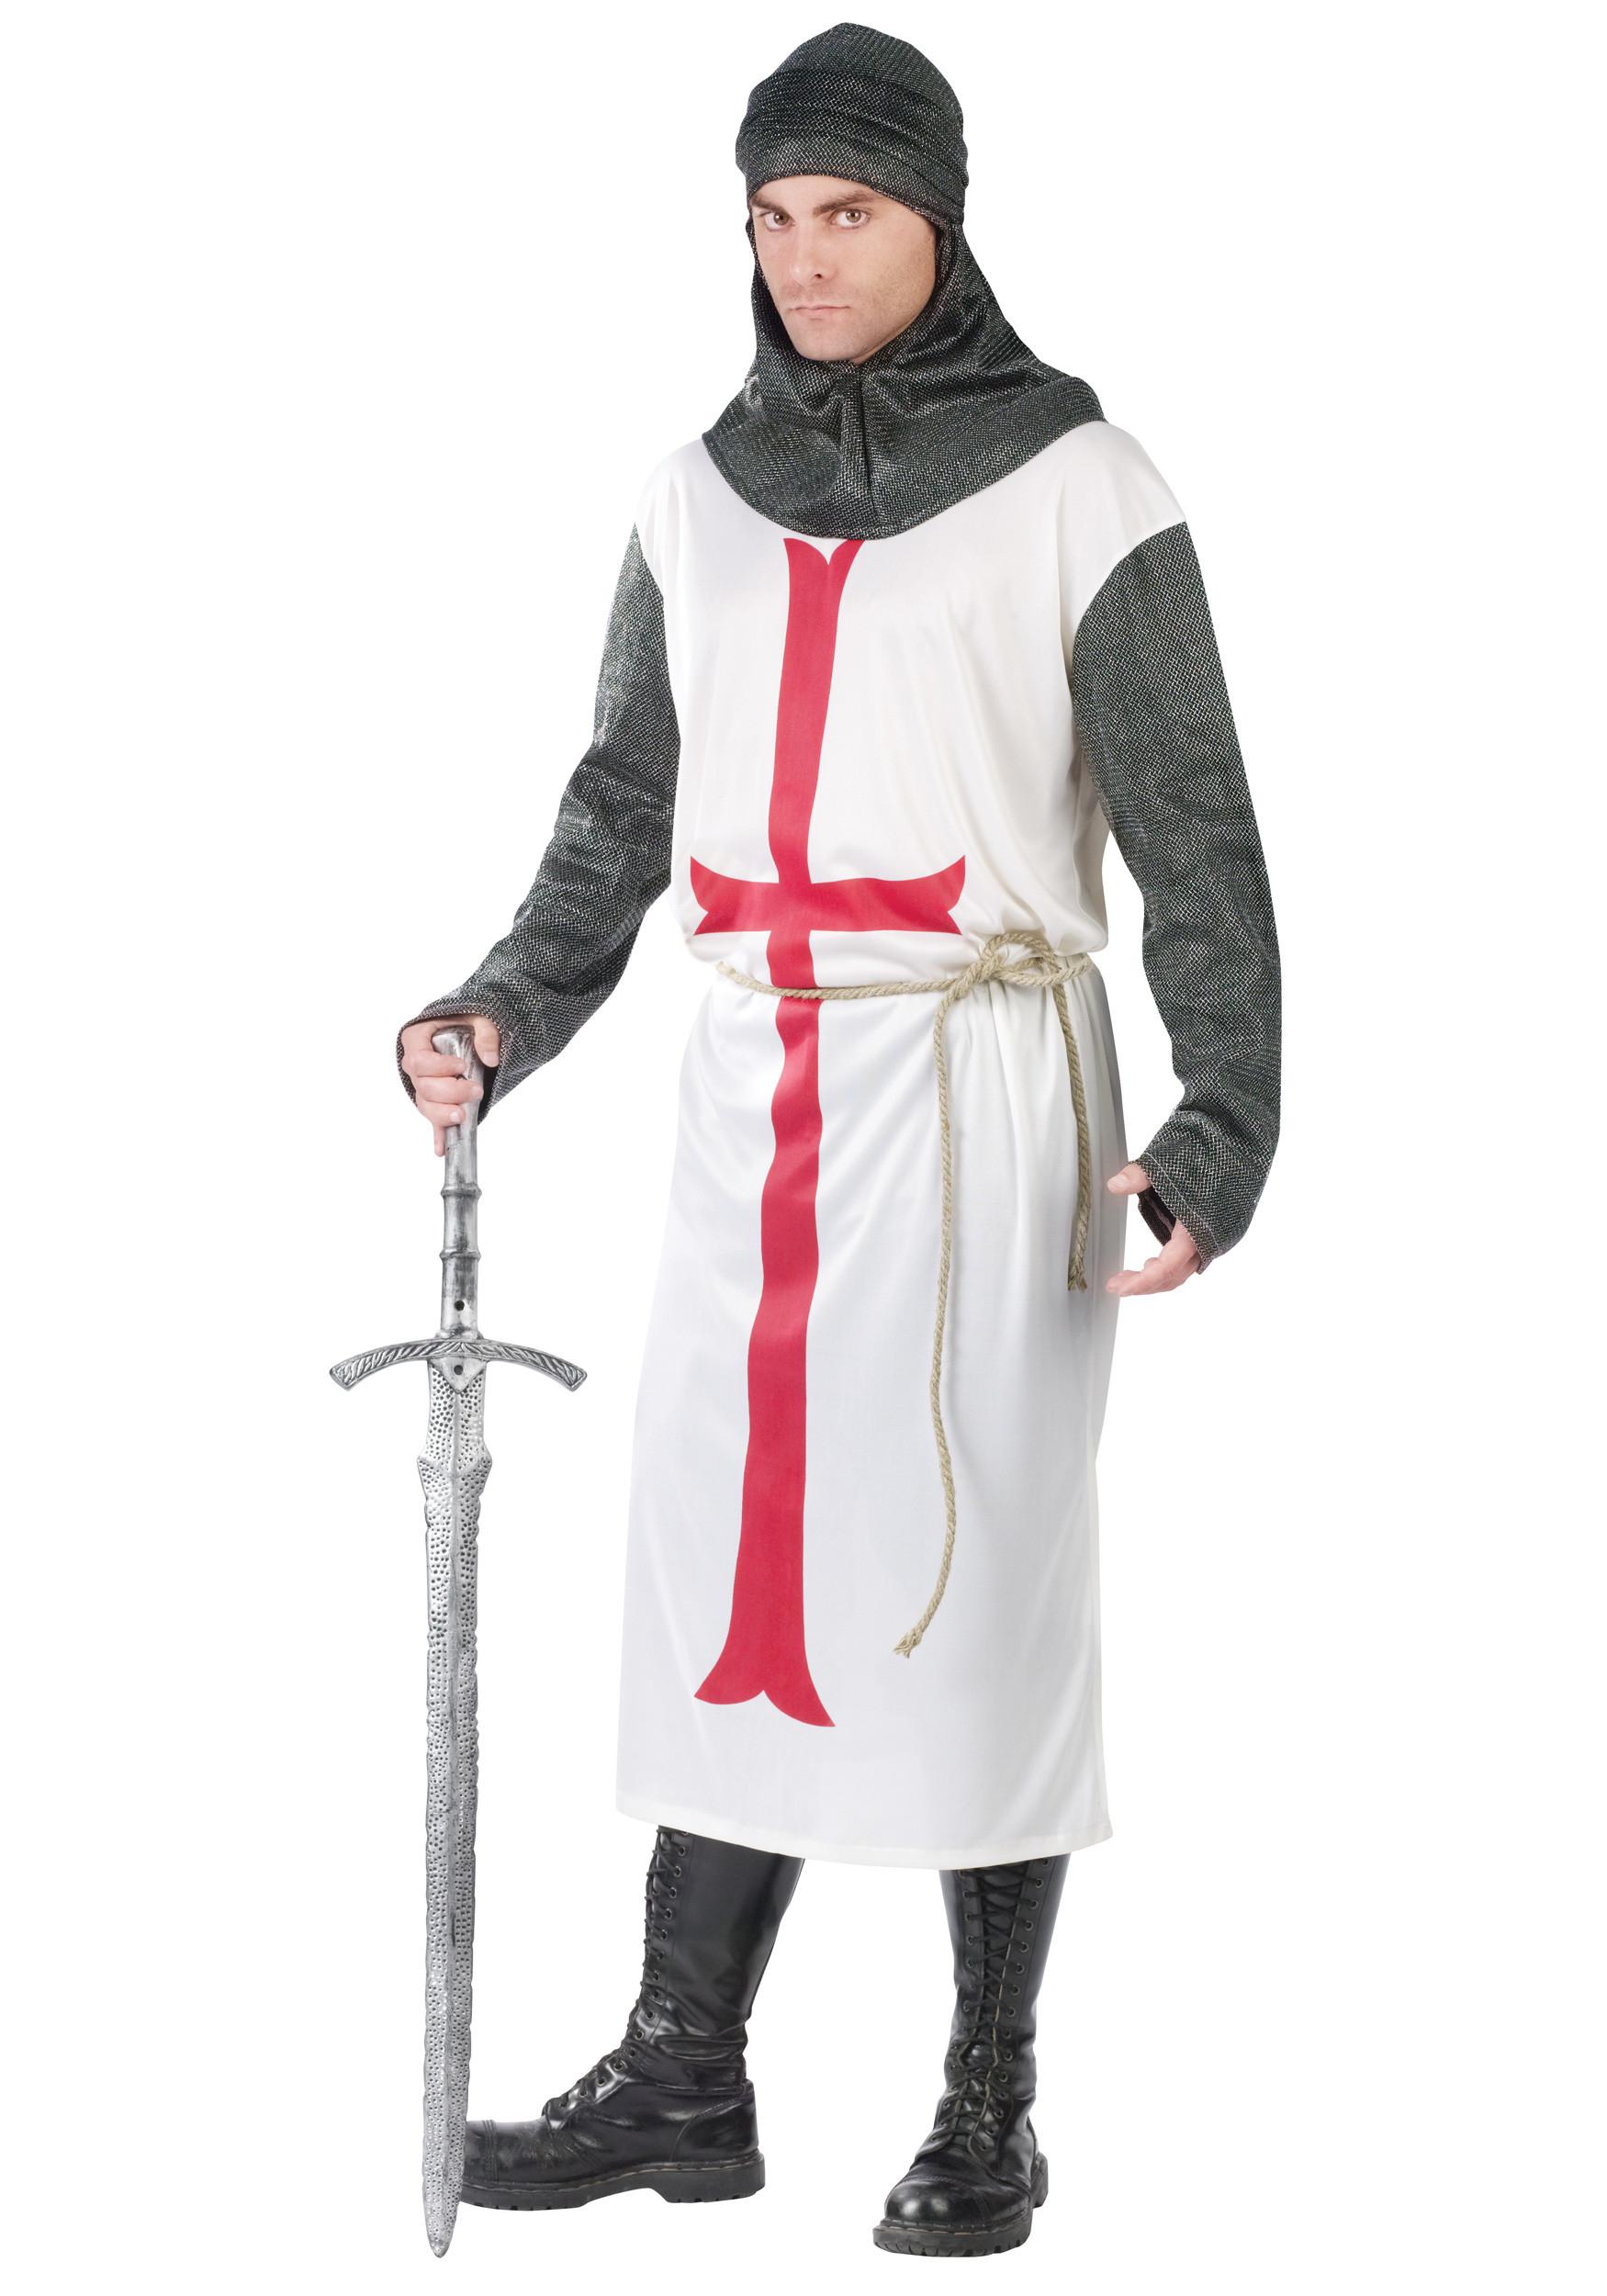 Res: 1750x2500, Wallpaper Knight Templar Knight Download Photo Clipart #P4Q4vK.